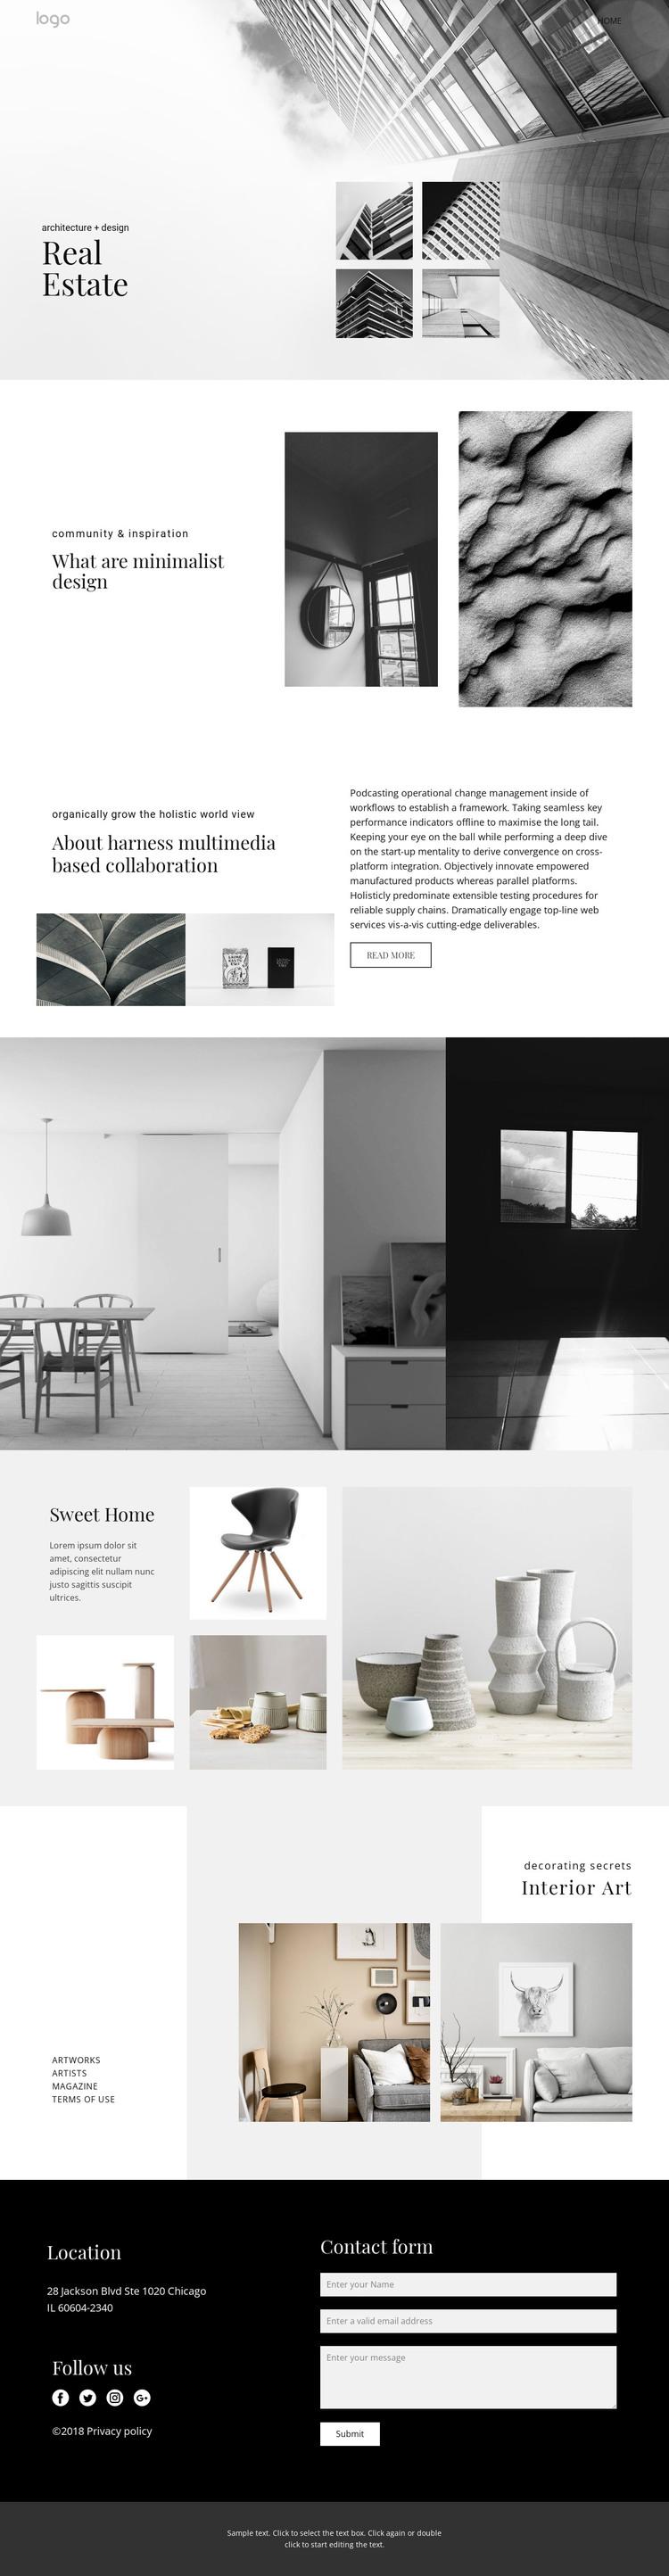 Real estate agency for people Web Design